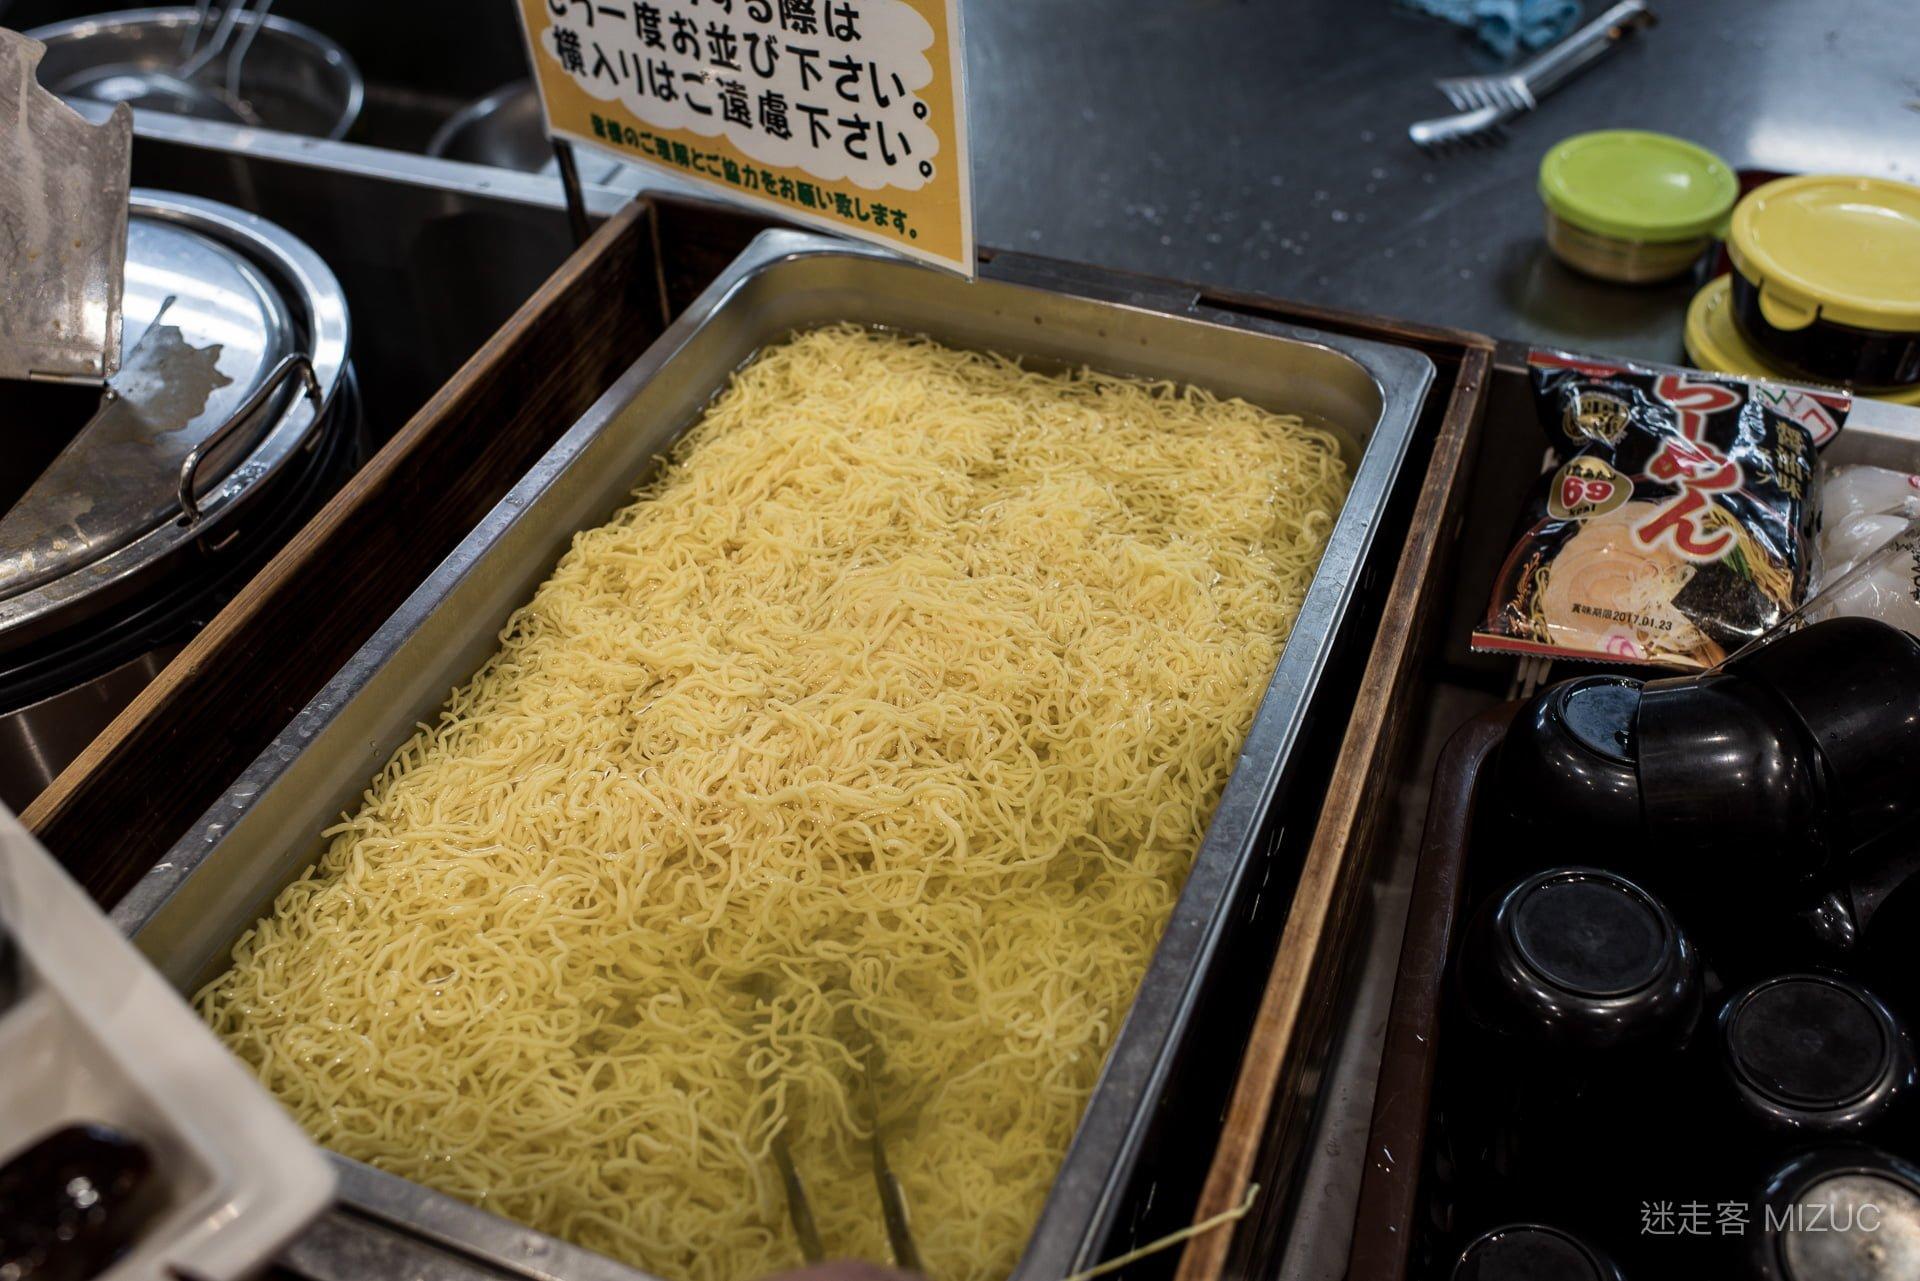 201711 Ibaraki Tochigi Gunma Japan Travel By RentalCar 90 日本自駕旅遊/北關東三縣「茨城、櫪木、群馬」秋天美食、溫泉與瀑布秘境百景(精選照片分享)